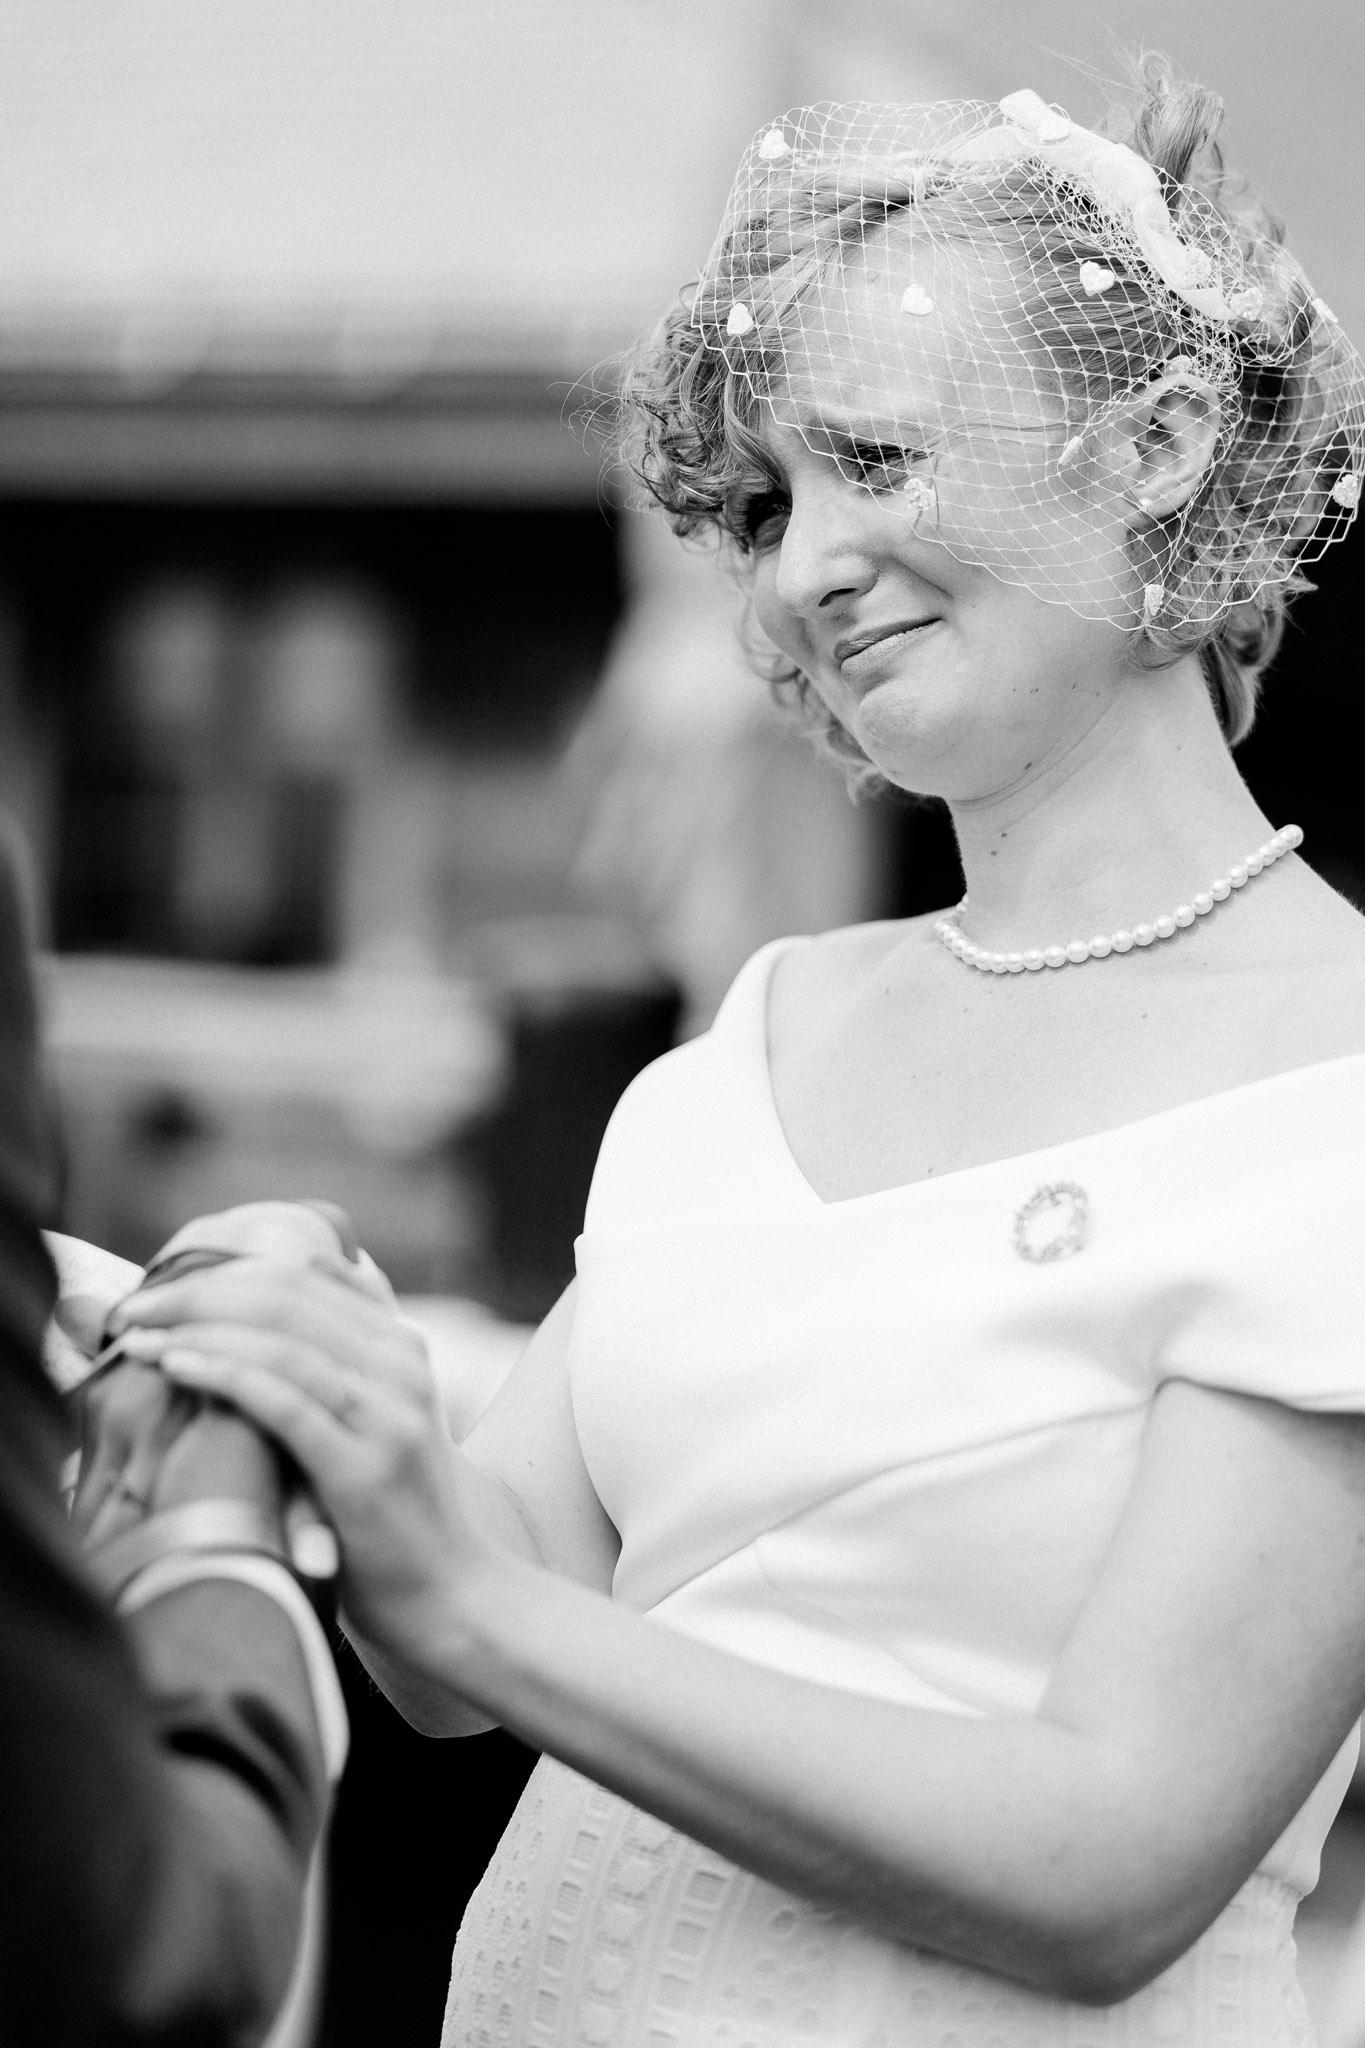 Lenl-Simmental-Buehlerhof-Pia-Anna-Christian-Wedding-Photography-EK-81.jpg